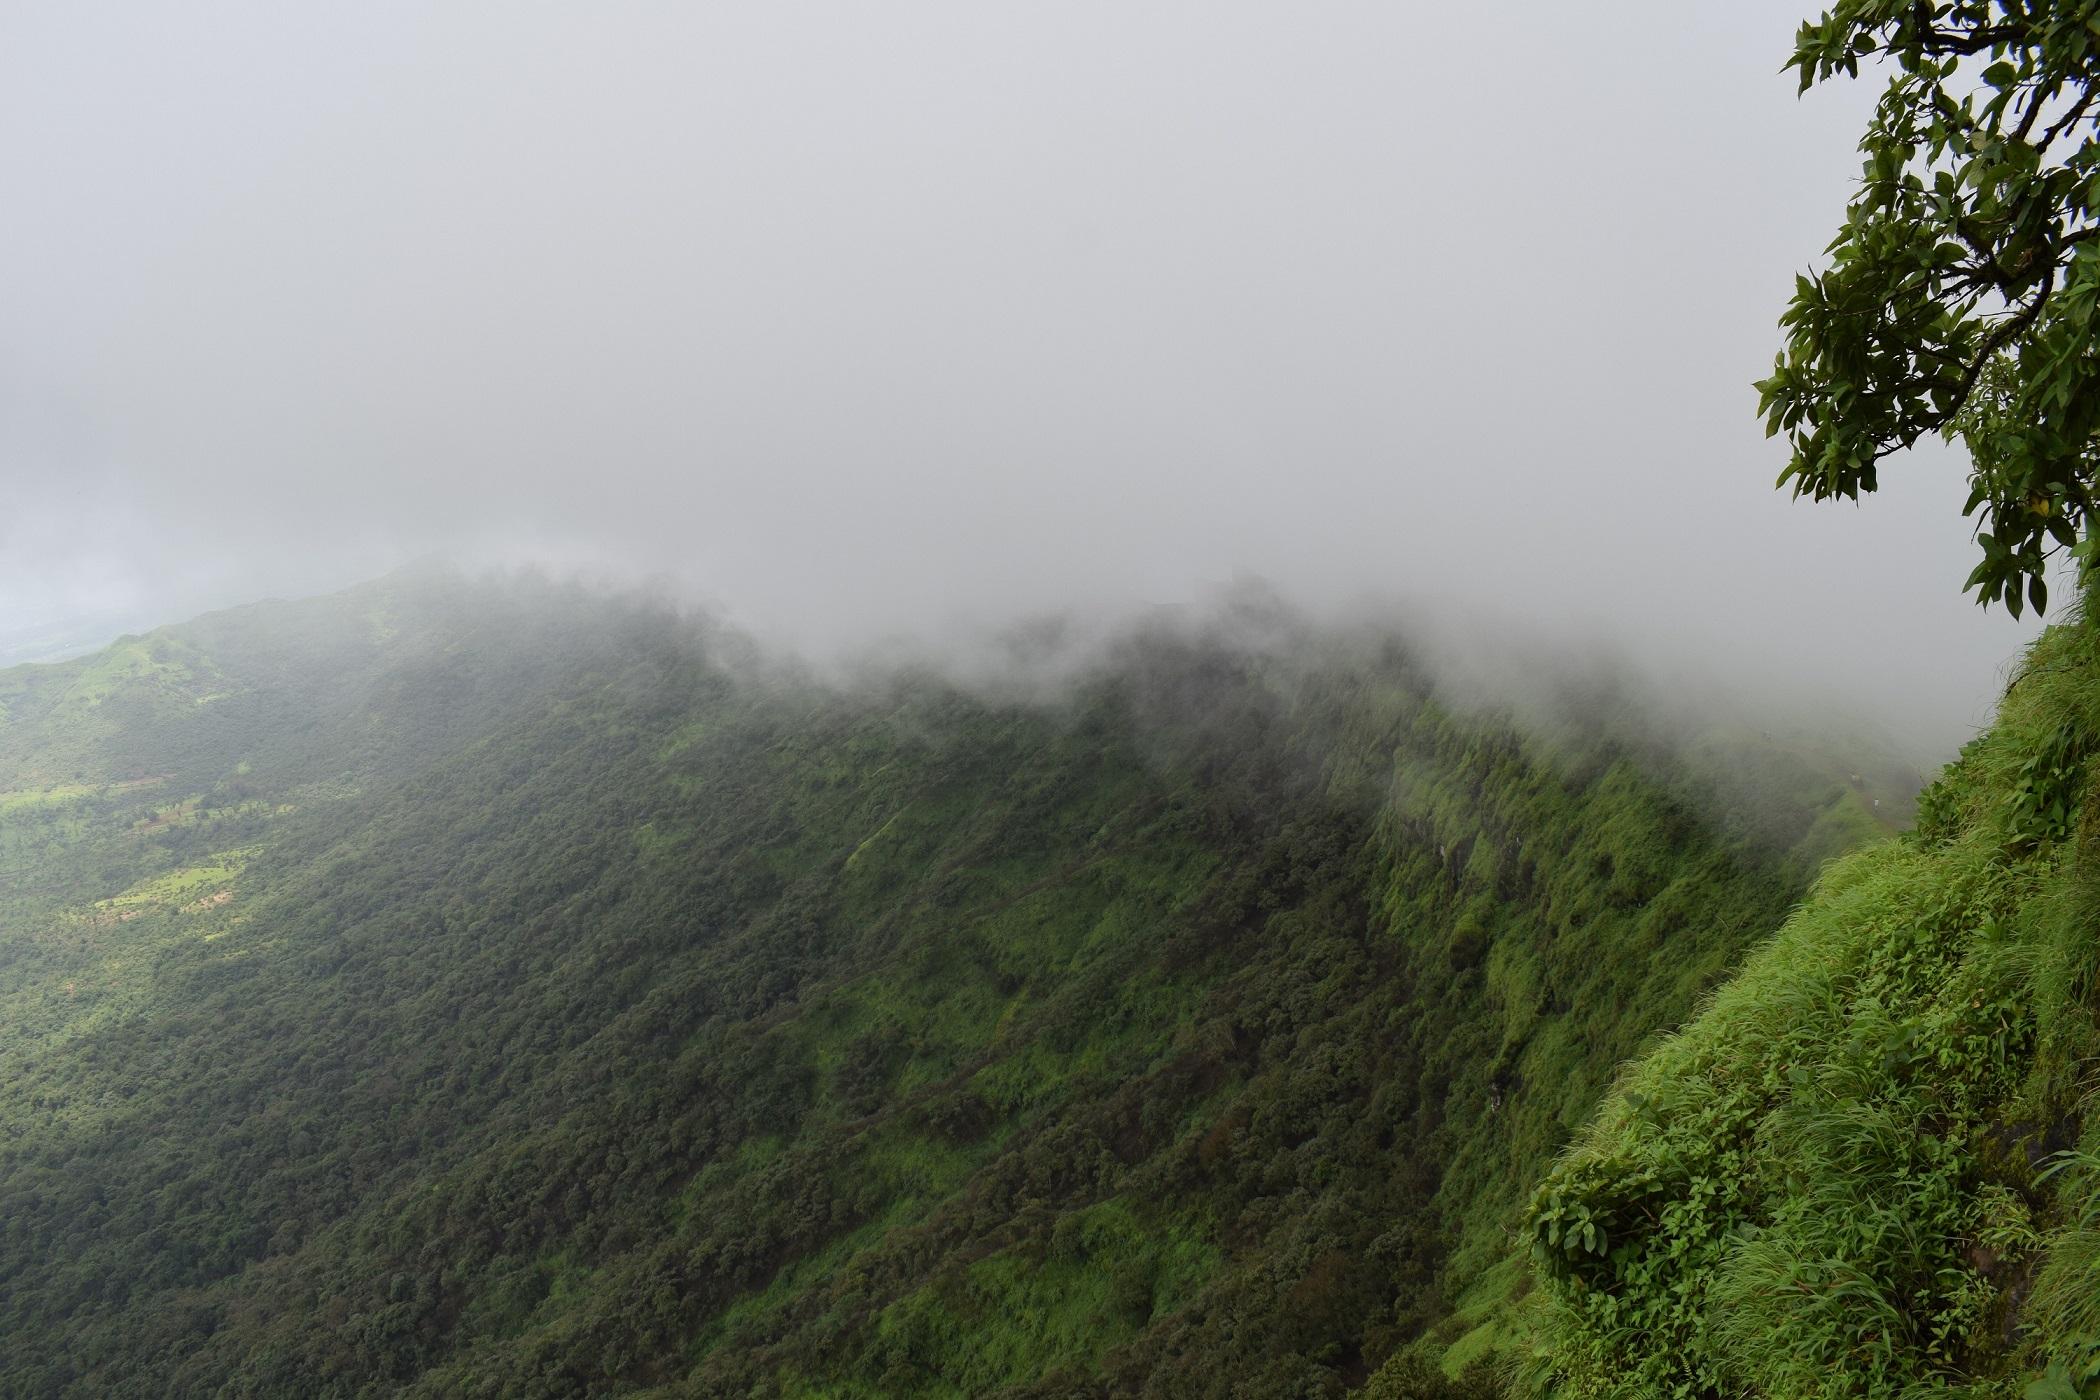 Rajgad Fort trekking photos mansoon DSLR 9 Rajgad Fort Pune - Information & Awesome Trekking experience